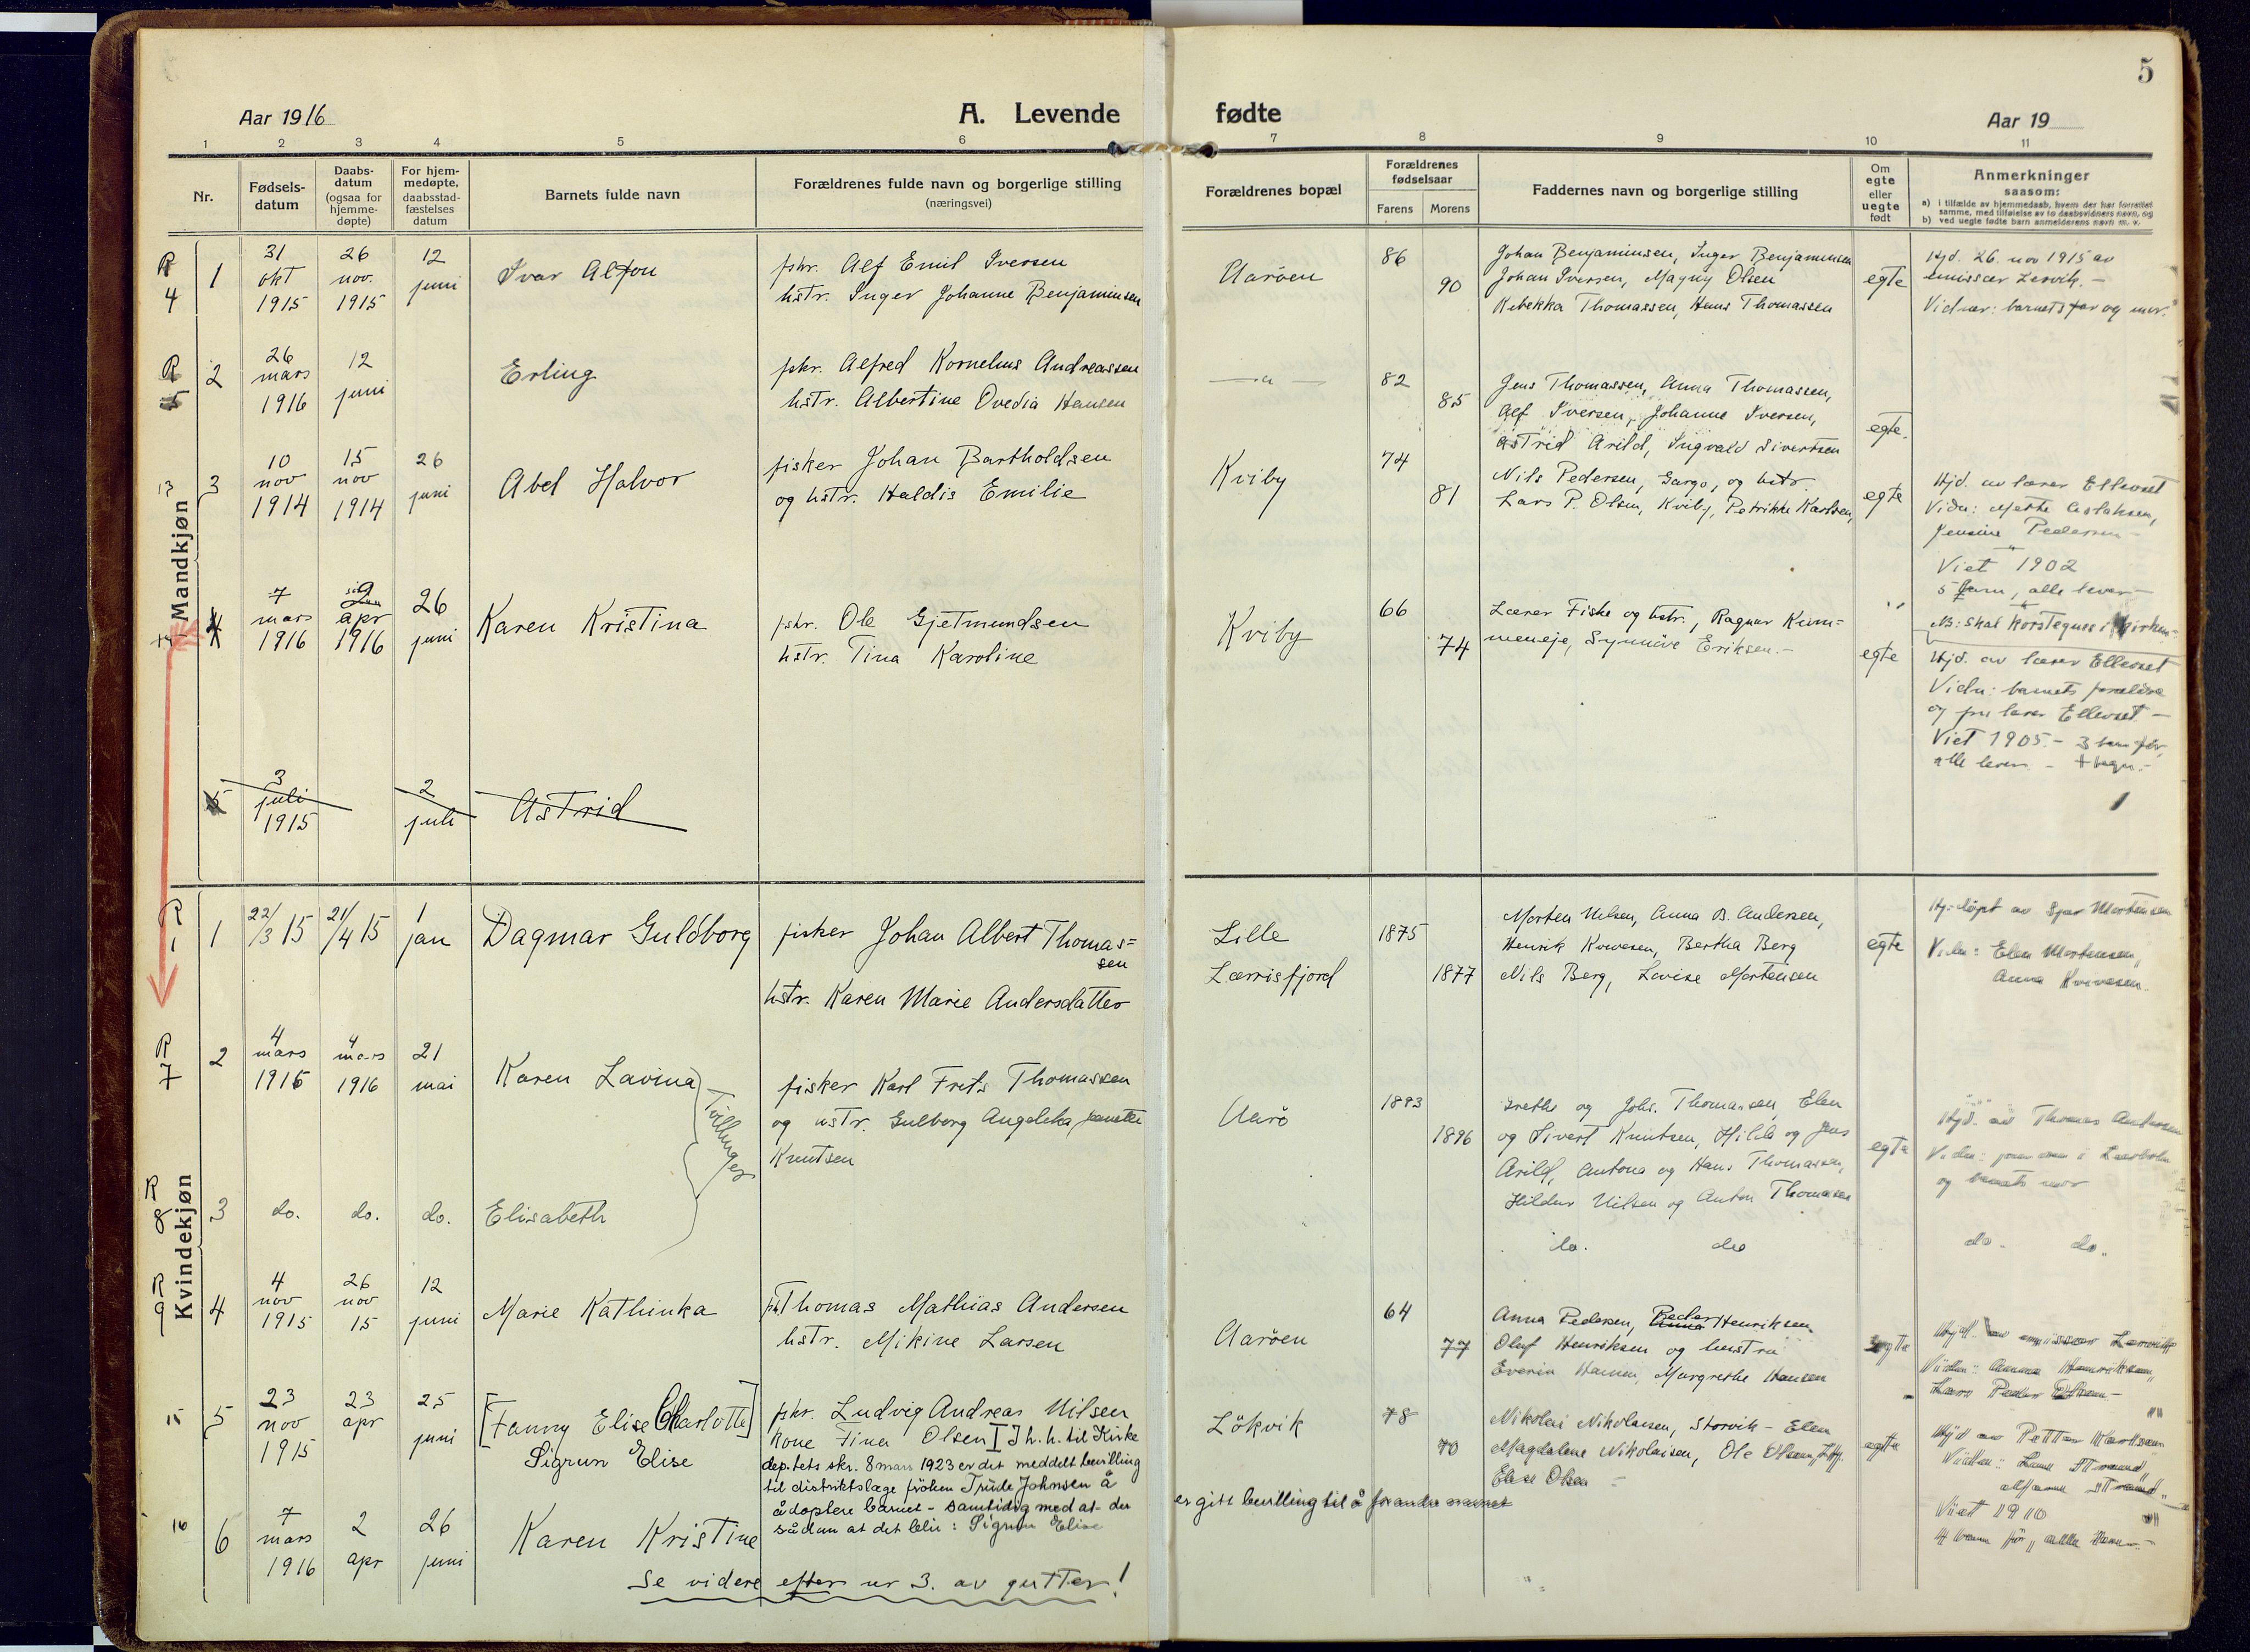 SATØ, Talvik sokneprestkontor, H/Ha/L0018kirke: Ministerialbok nr. 18, 1915-1924, s. 5